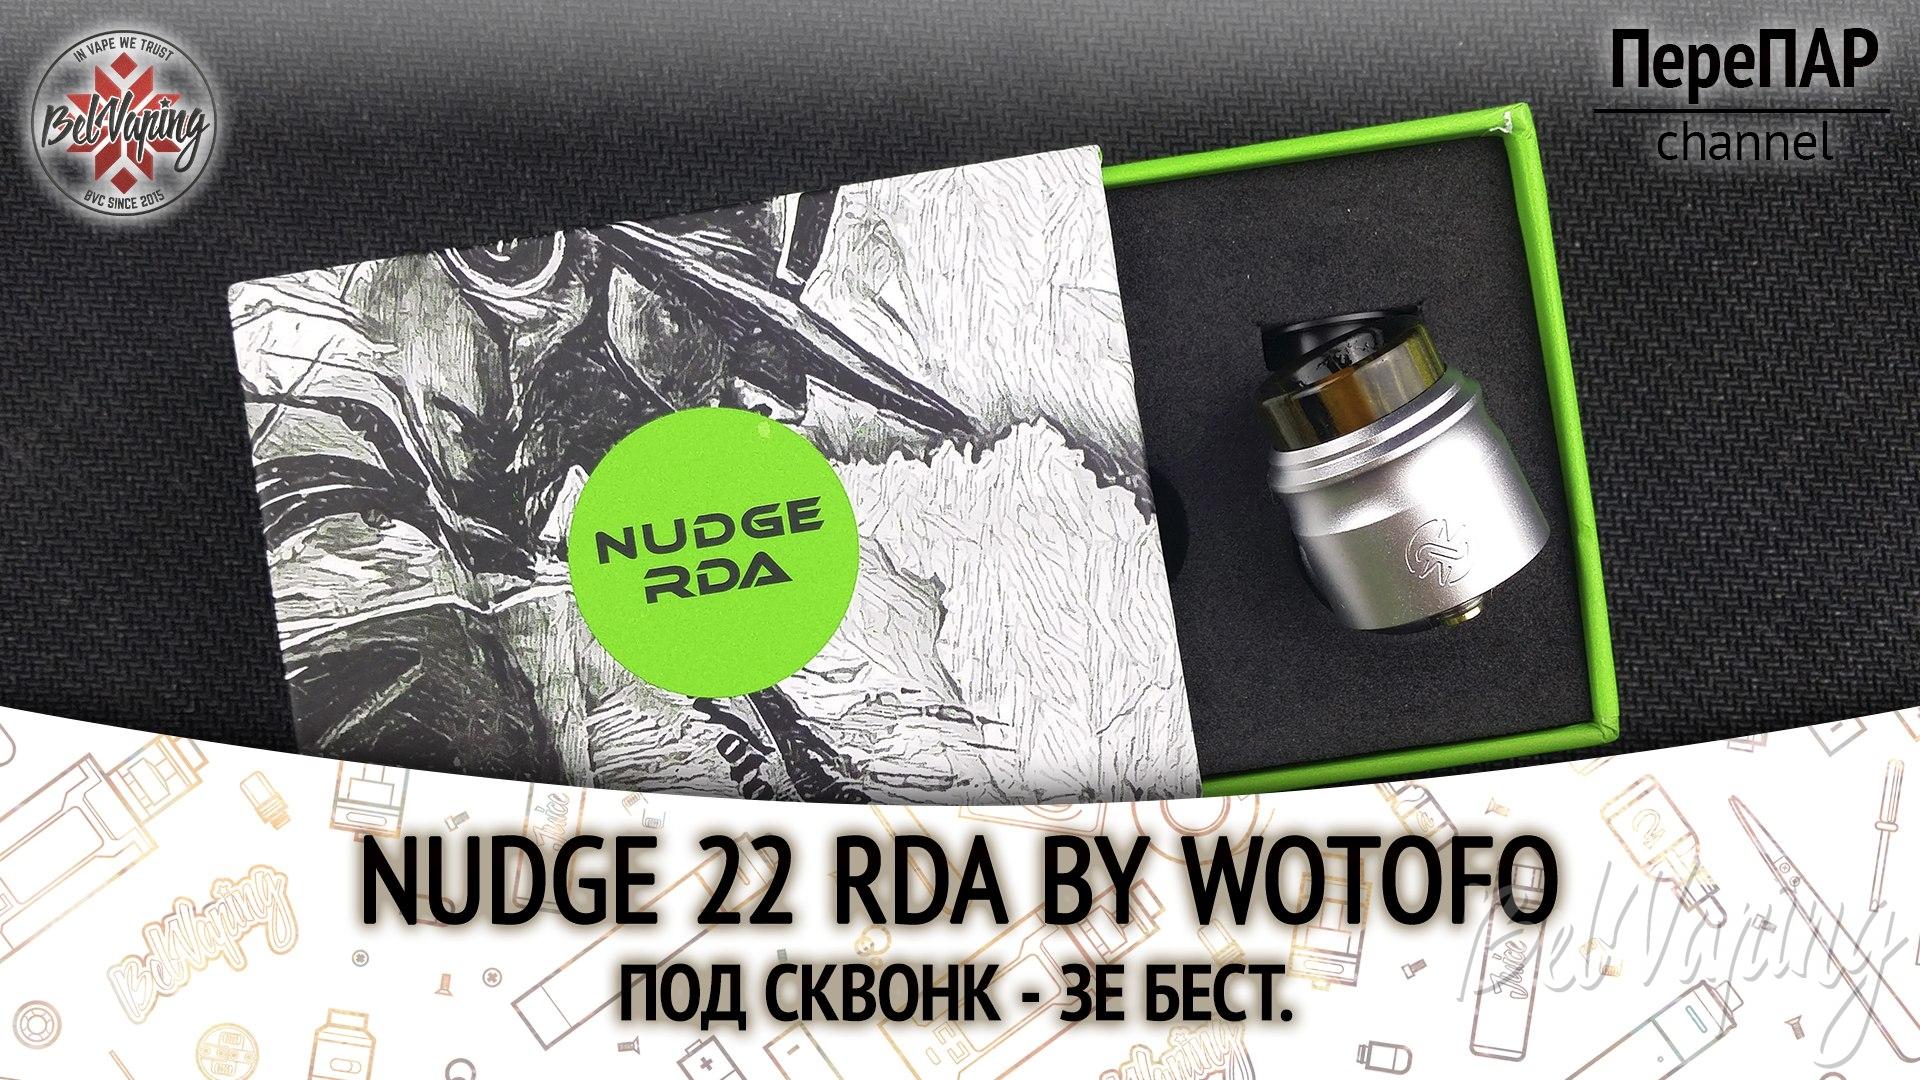 Видеообзор Nudhe 22 RDA от компании Wotofo